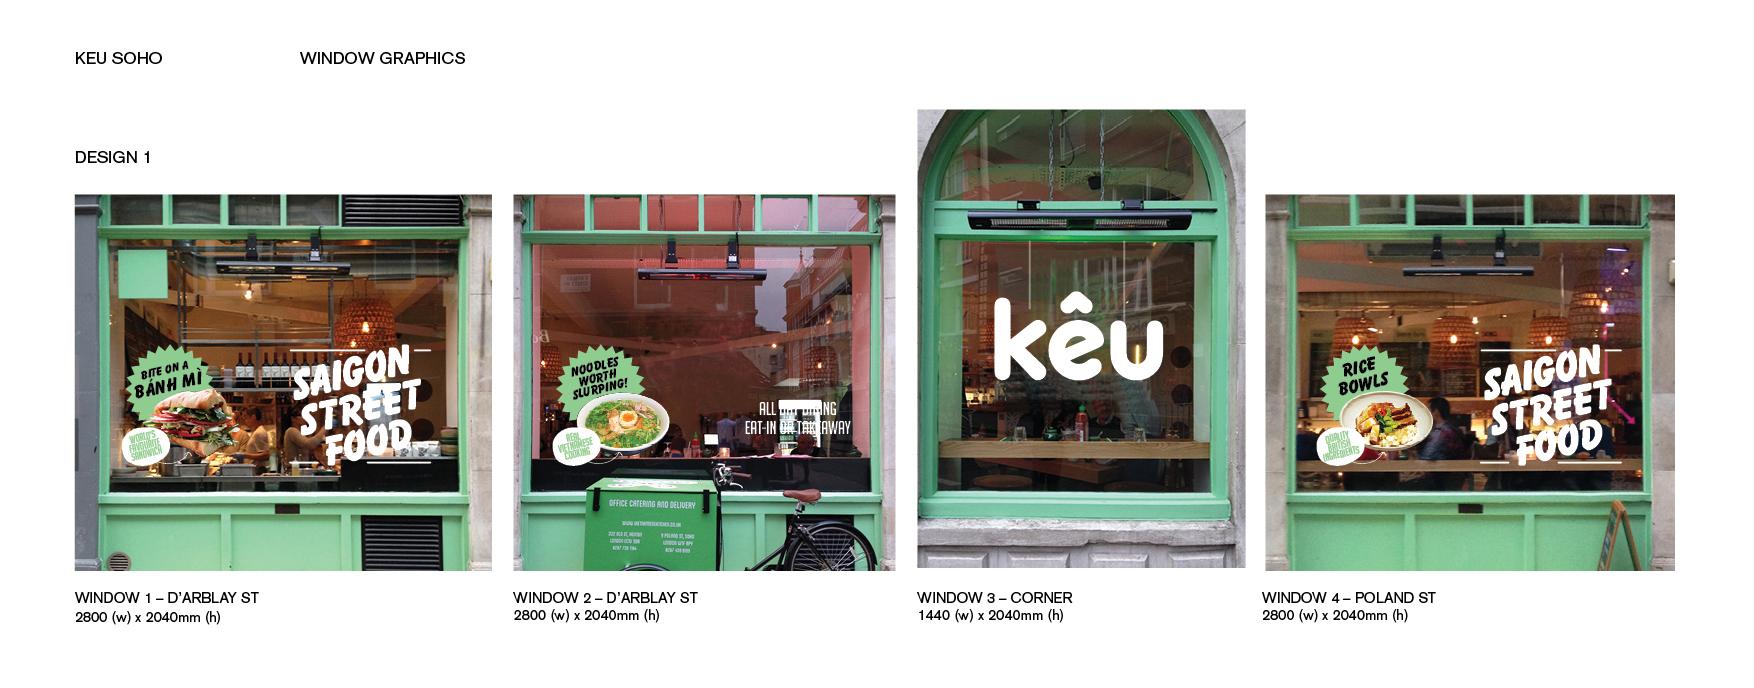 Keu_Soho_window